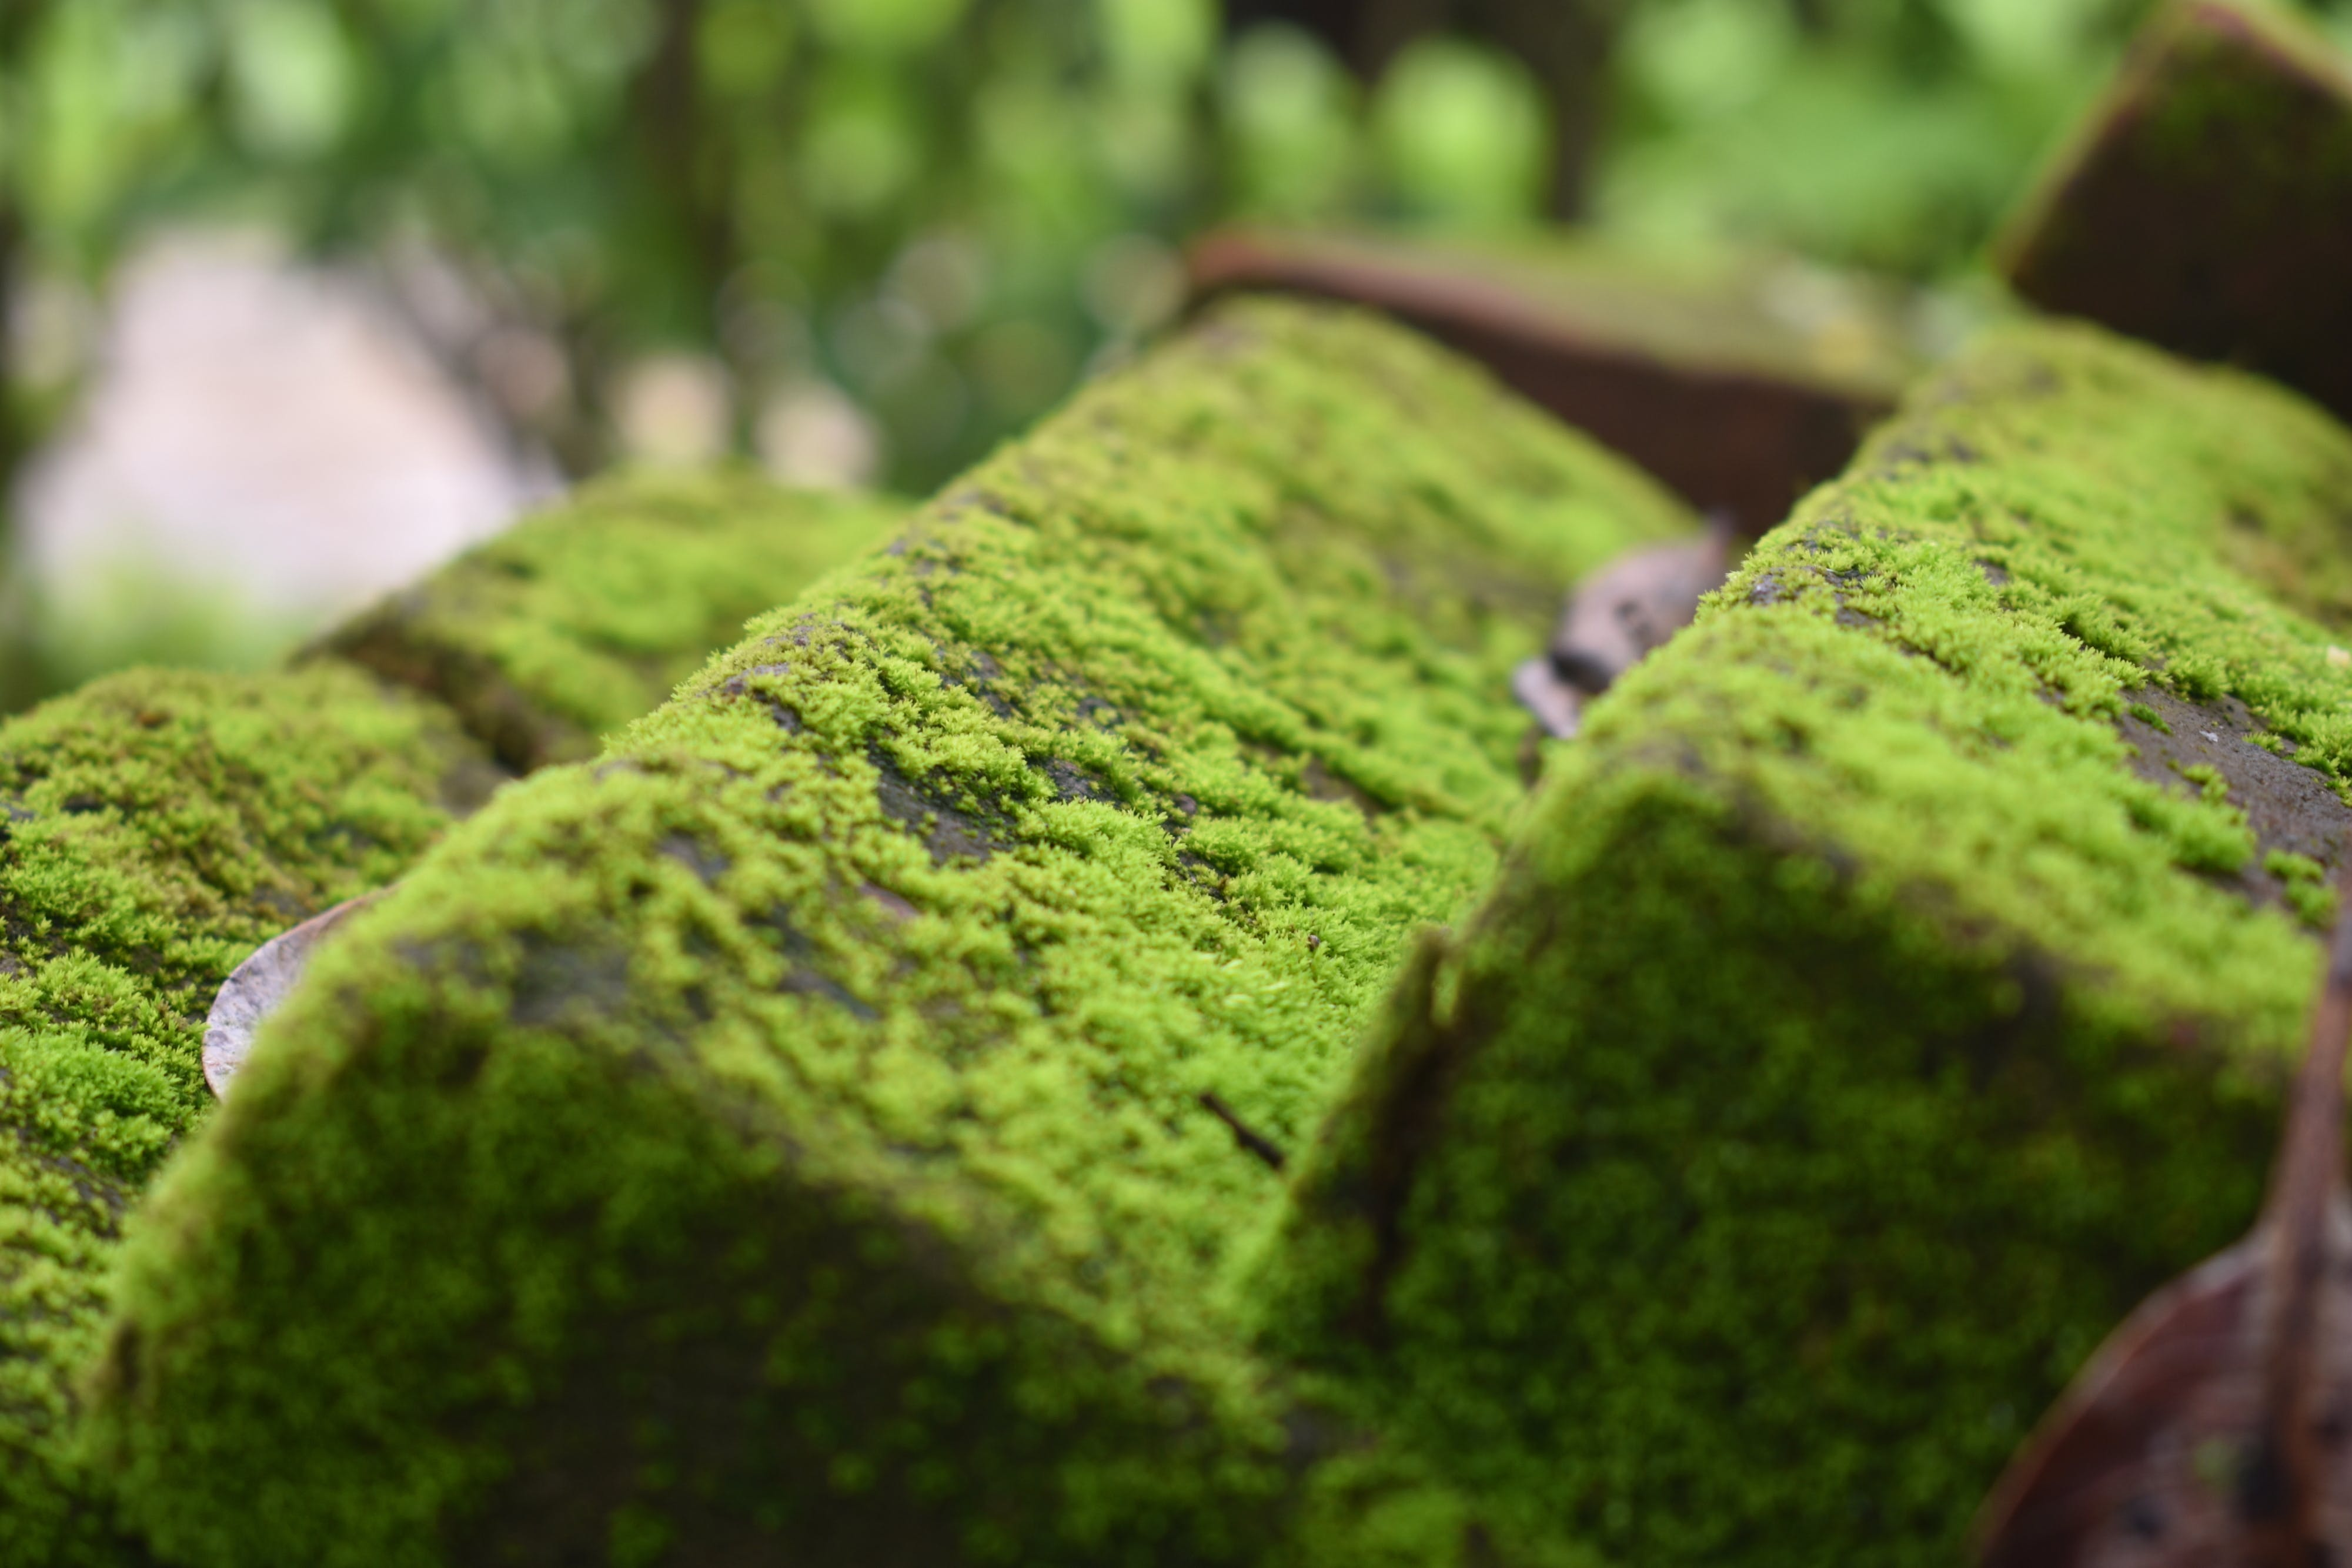 Algae on Concrete Pavement